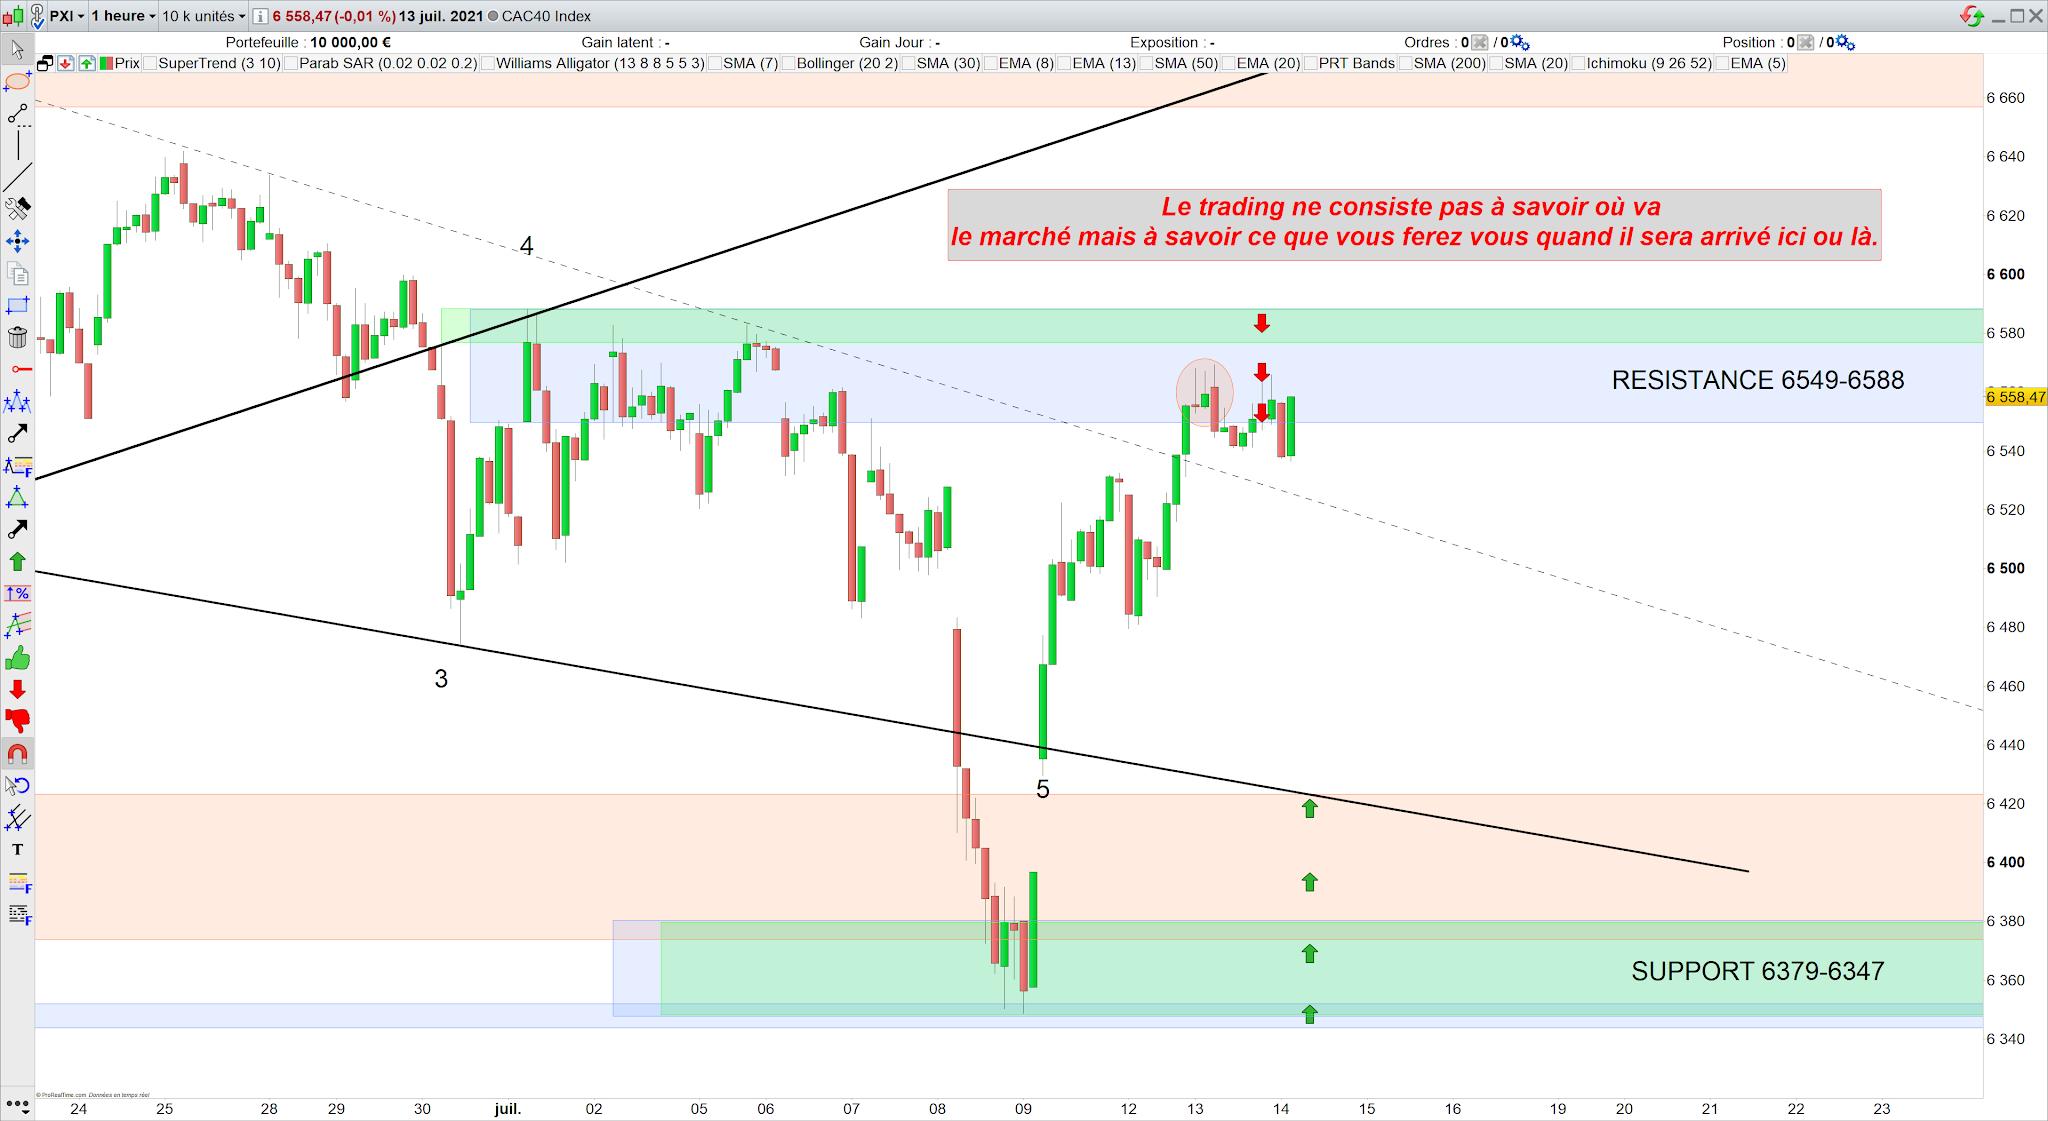 Bilan trading cac40 13/07/21